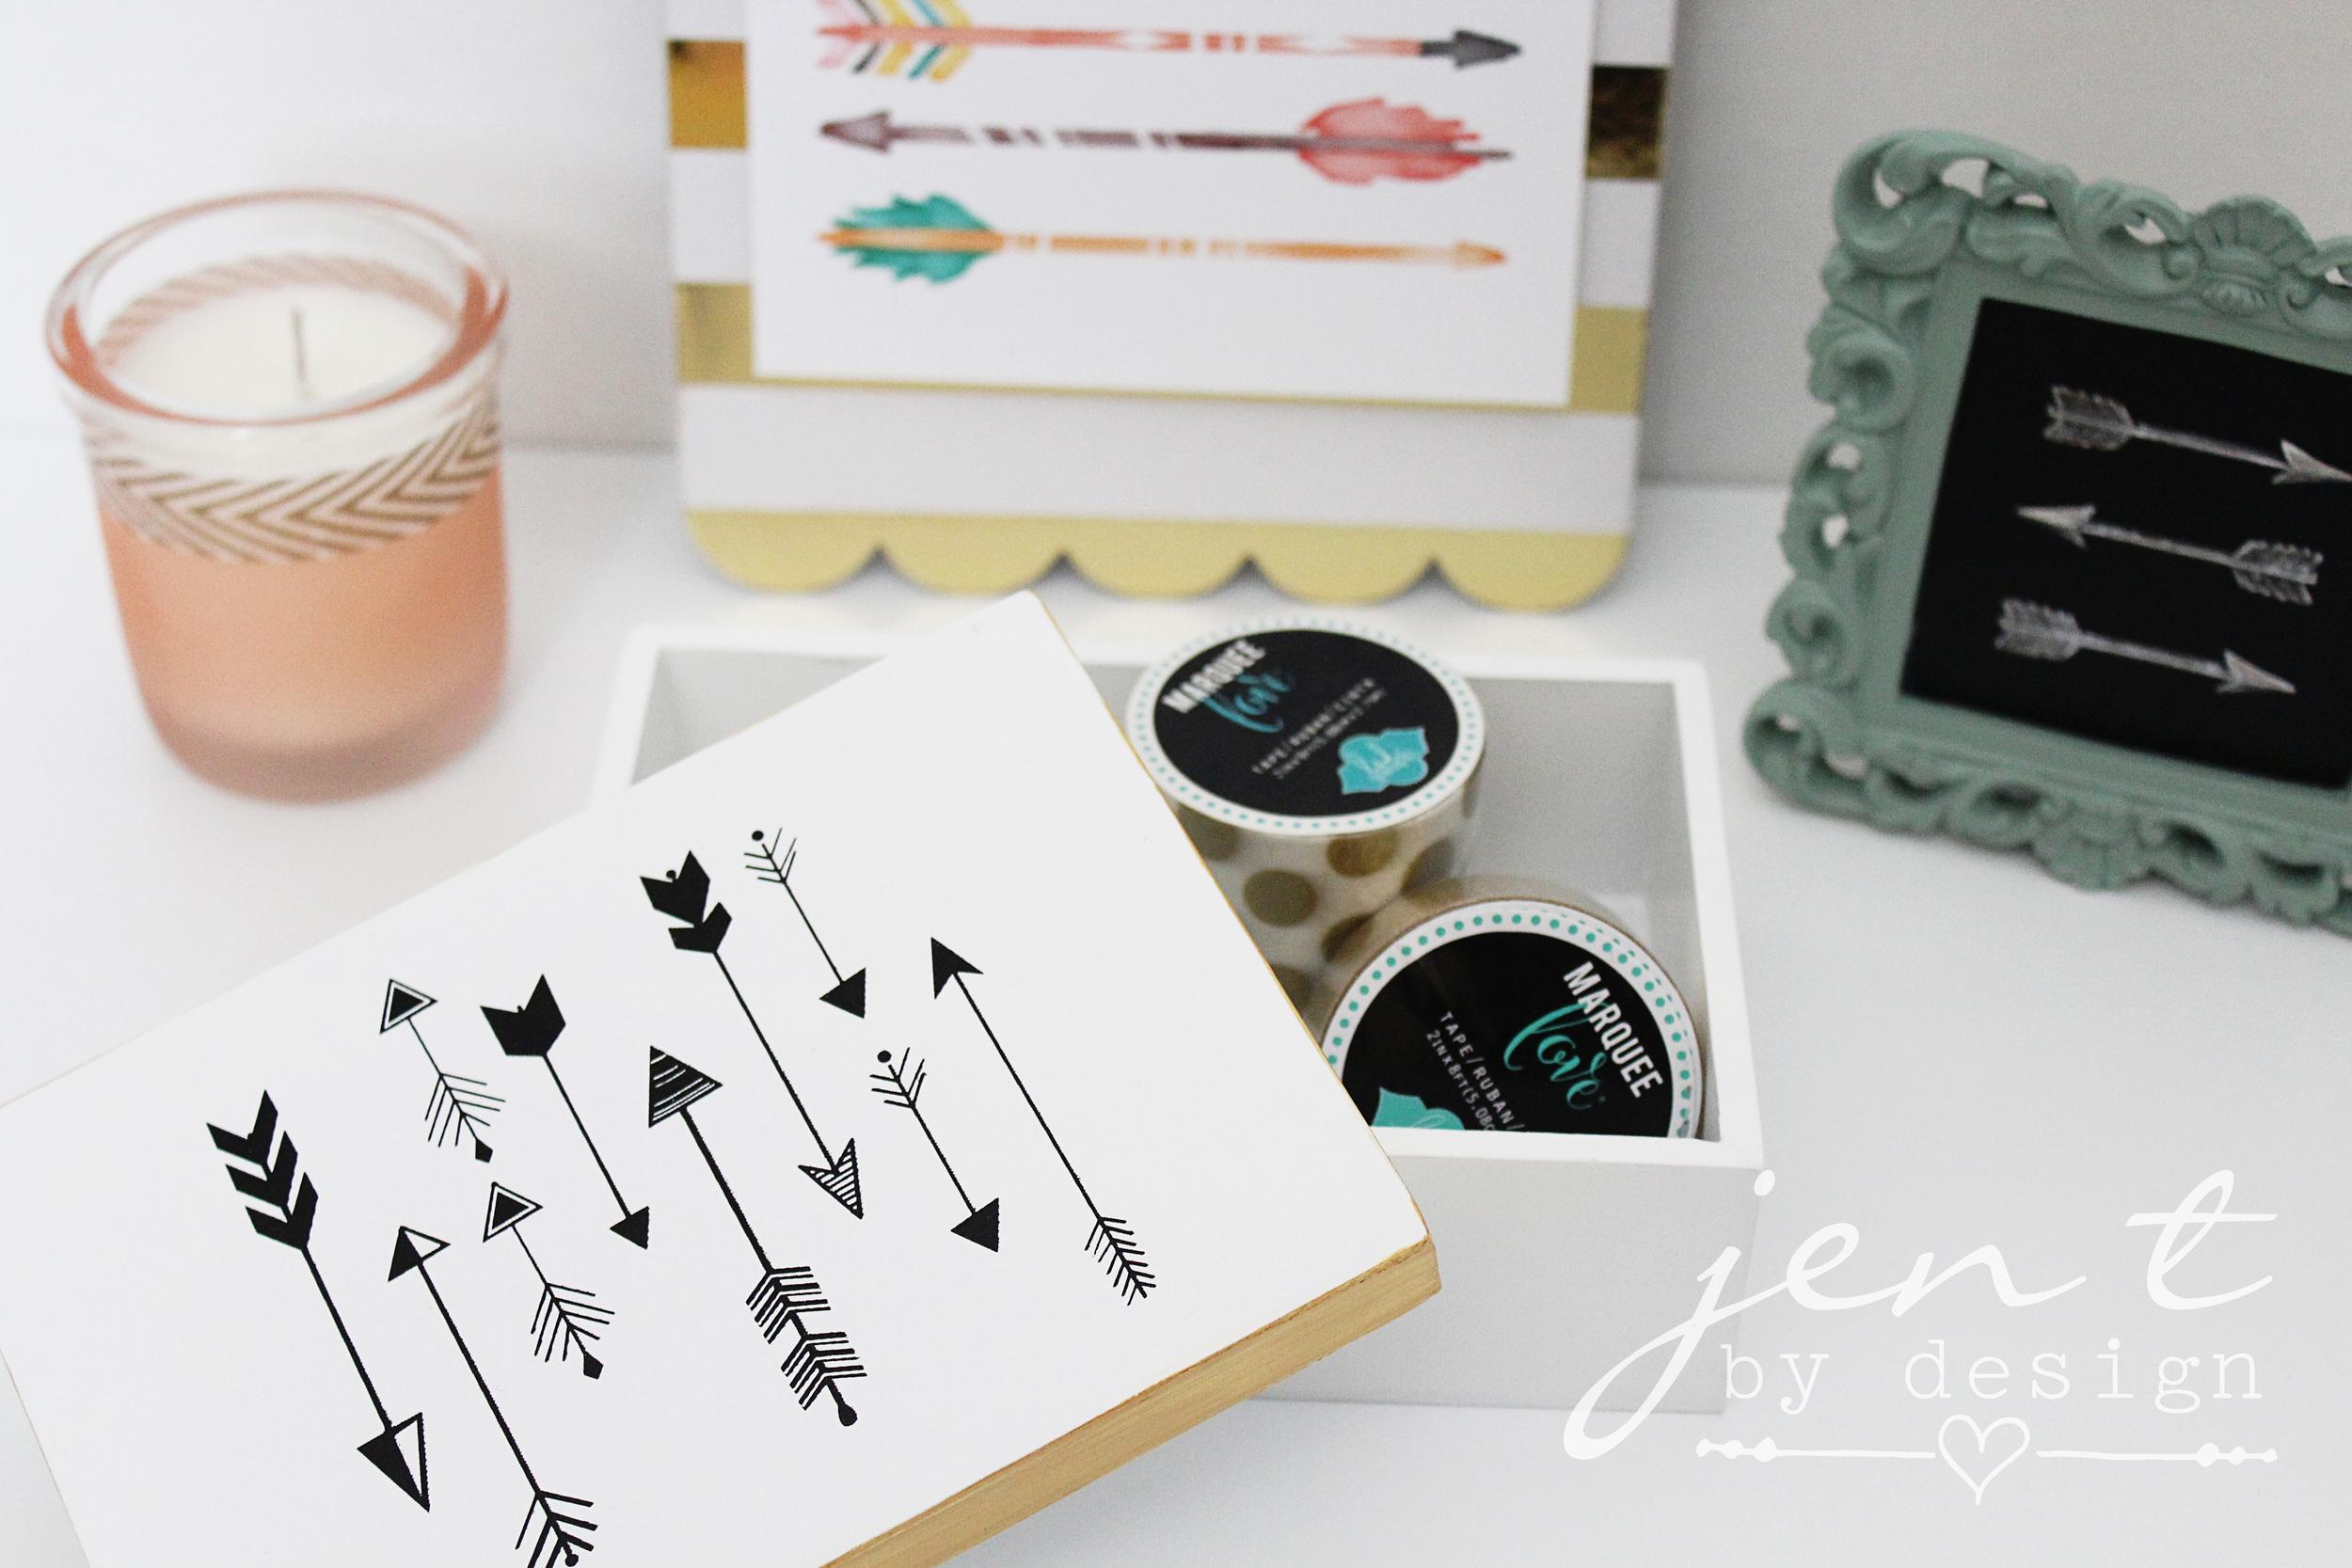 Jen T by Design Launch Party Giveaway